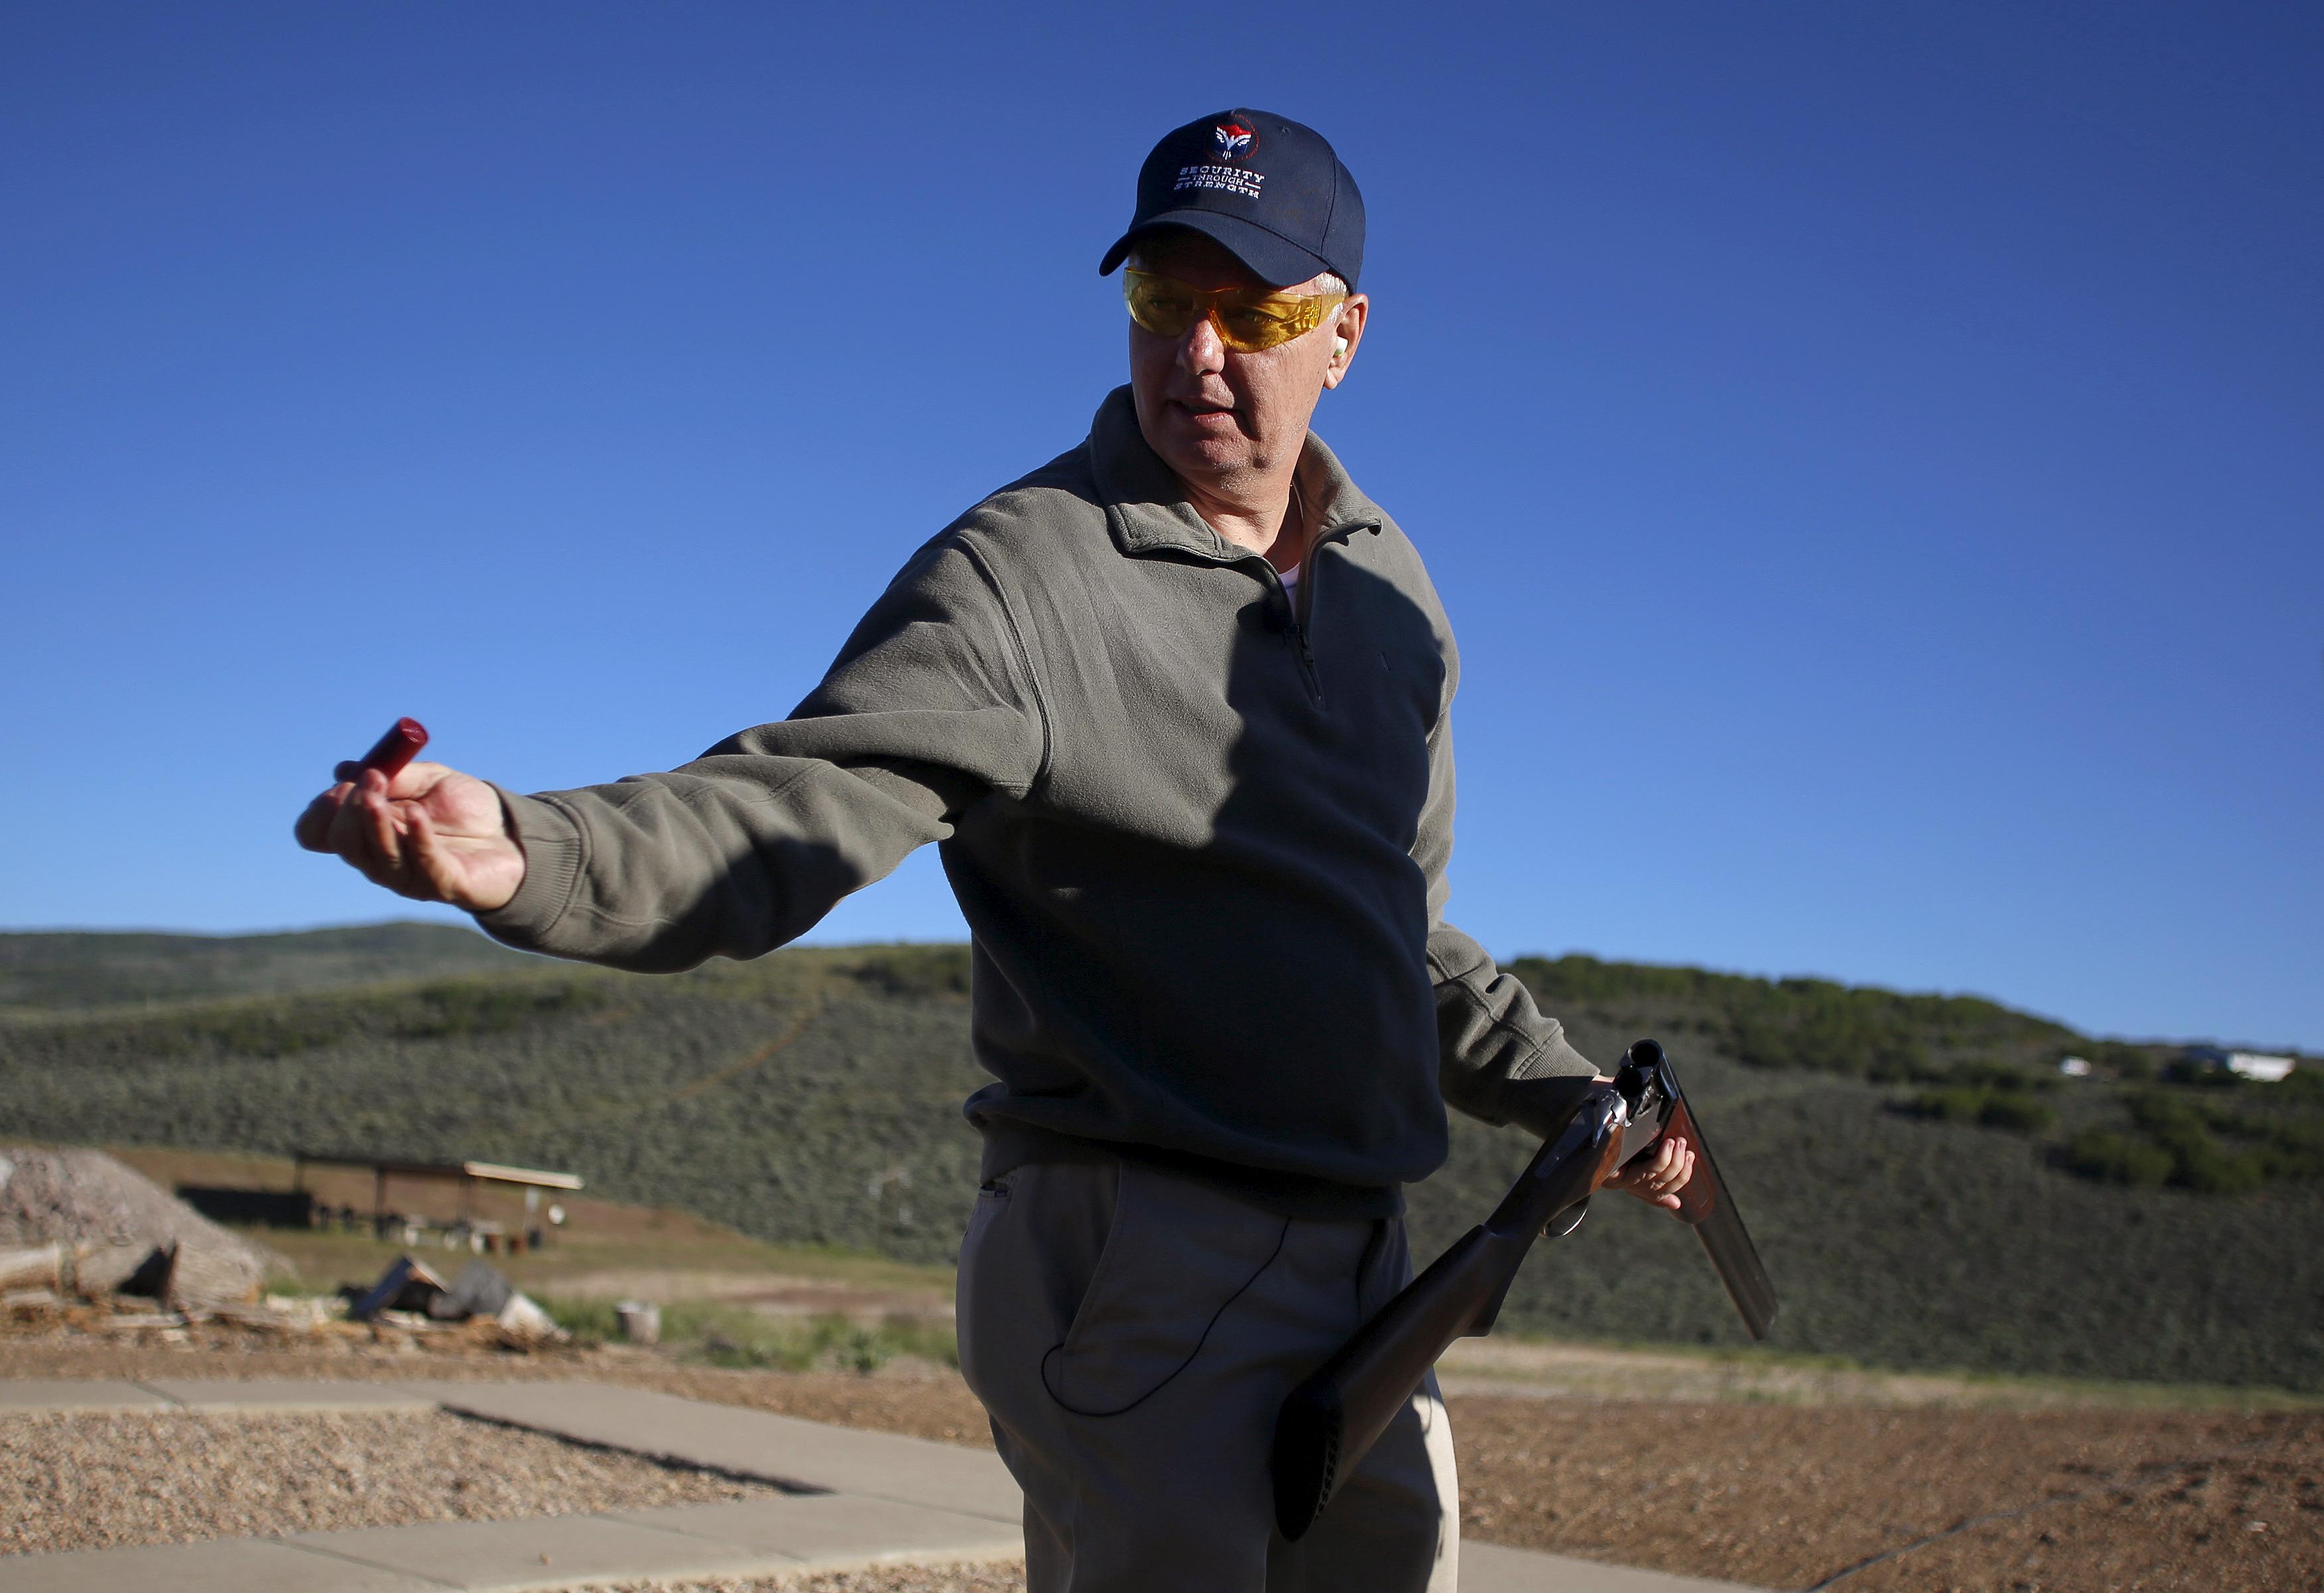 Republican presidential candidate U.S. Senator Lindsey Graham of South Carolina shoots skeet in Kamas, during a break at the E2 Summit held by former Republican presidential nominee Mitt Romney, at the Deer Valley Resort outside Park City, Utah.